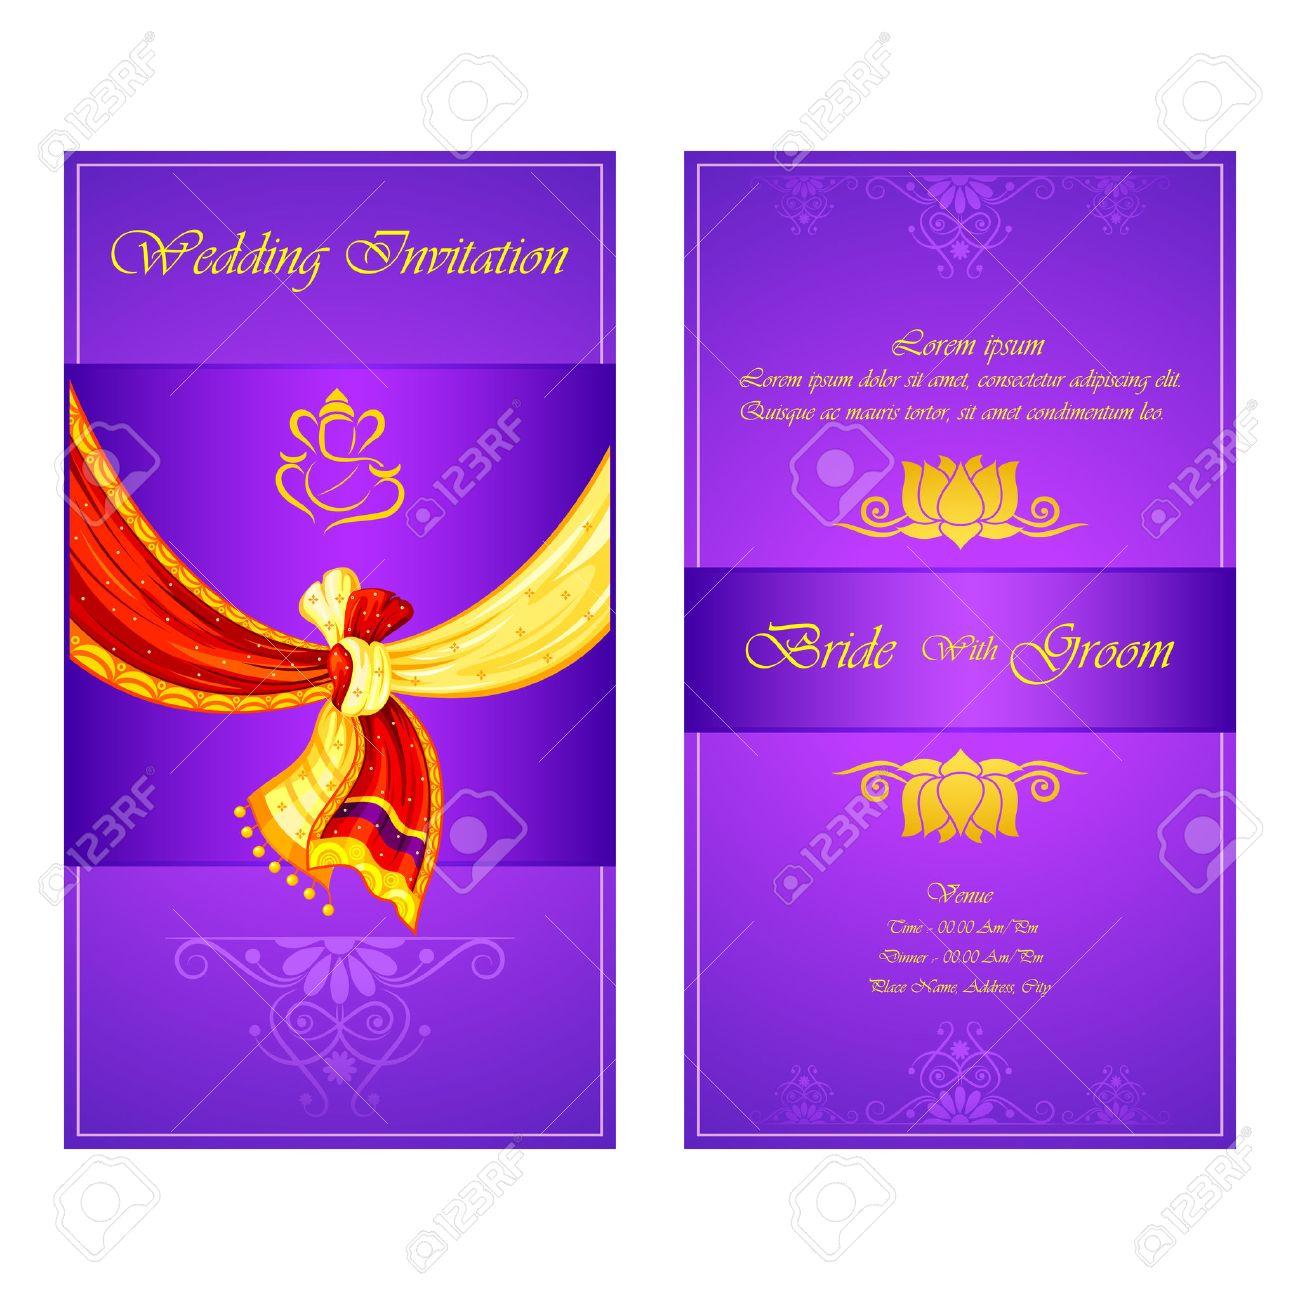 Vector Illustration Of Indian Wedding Invitation Card Stock